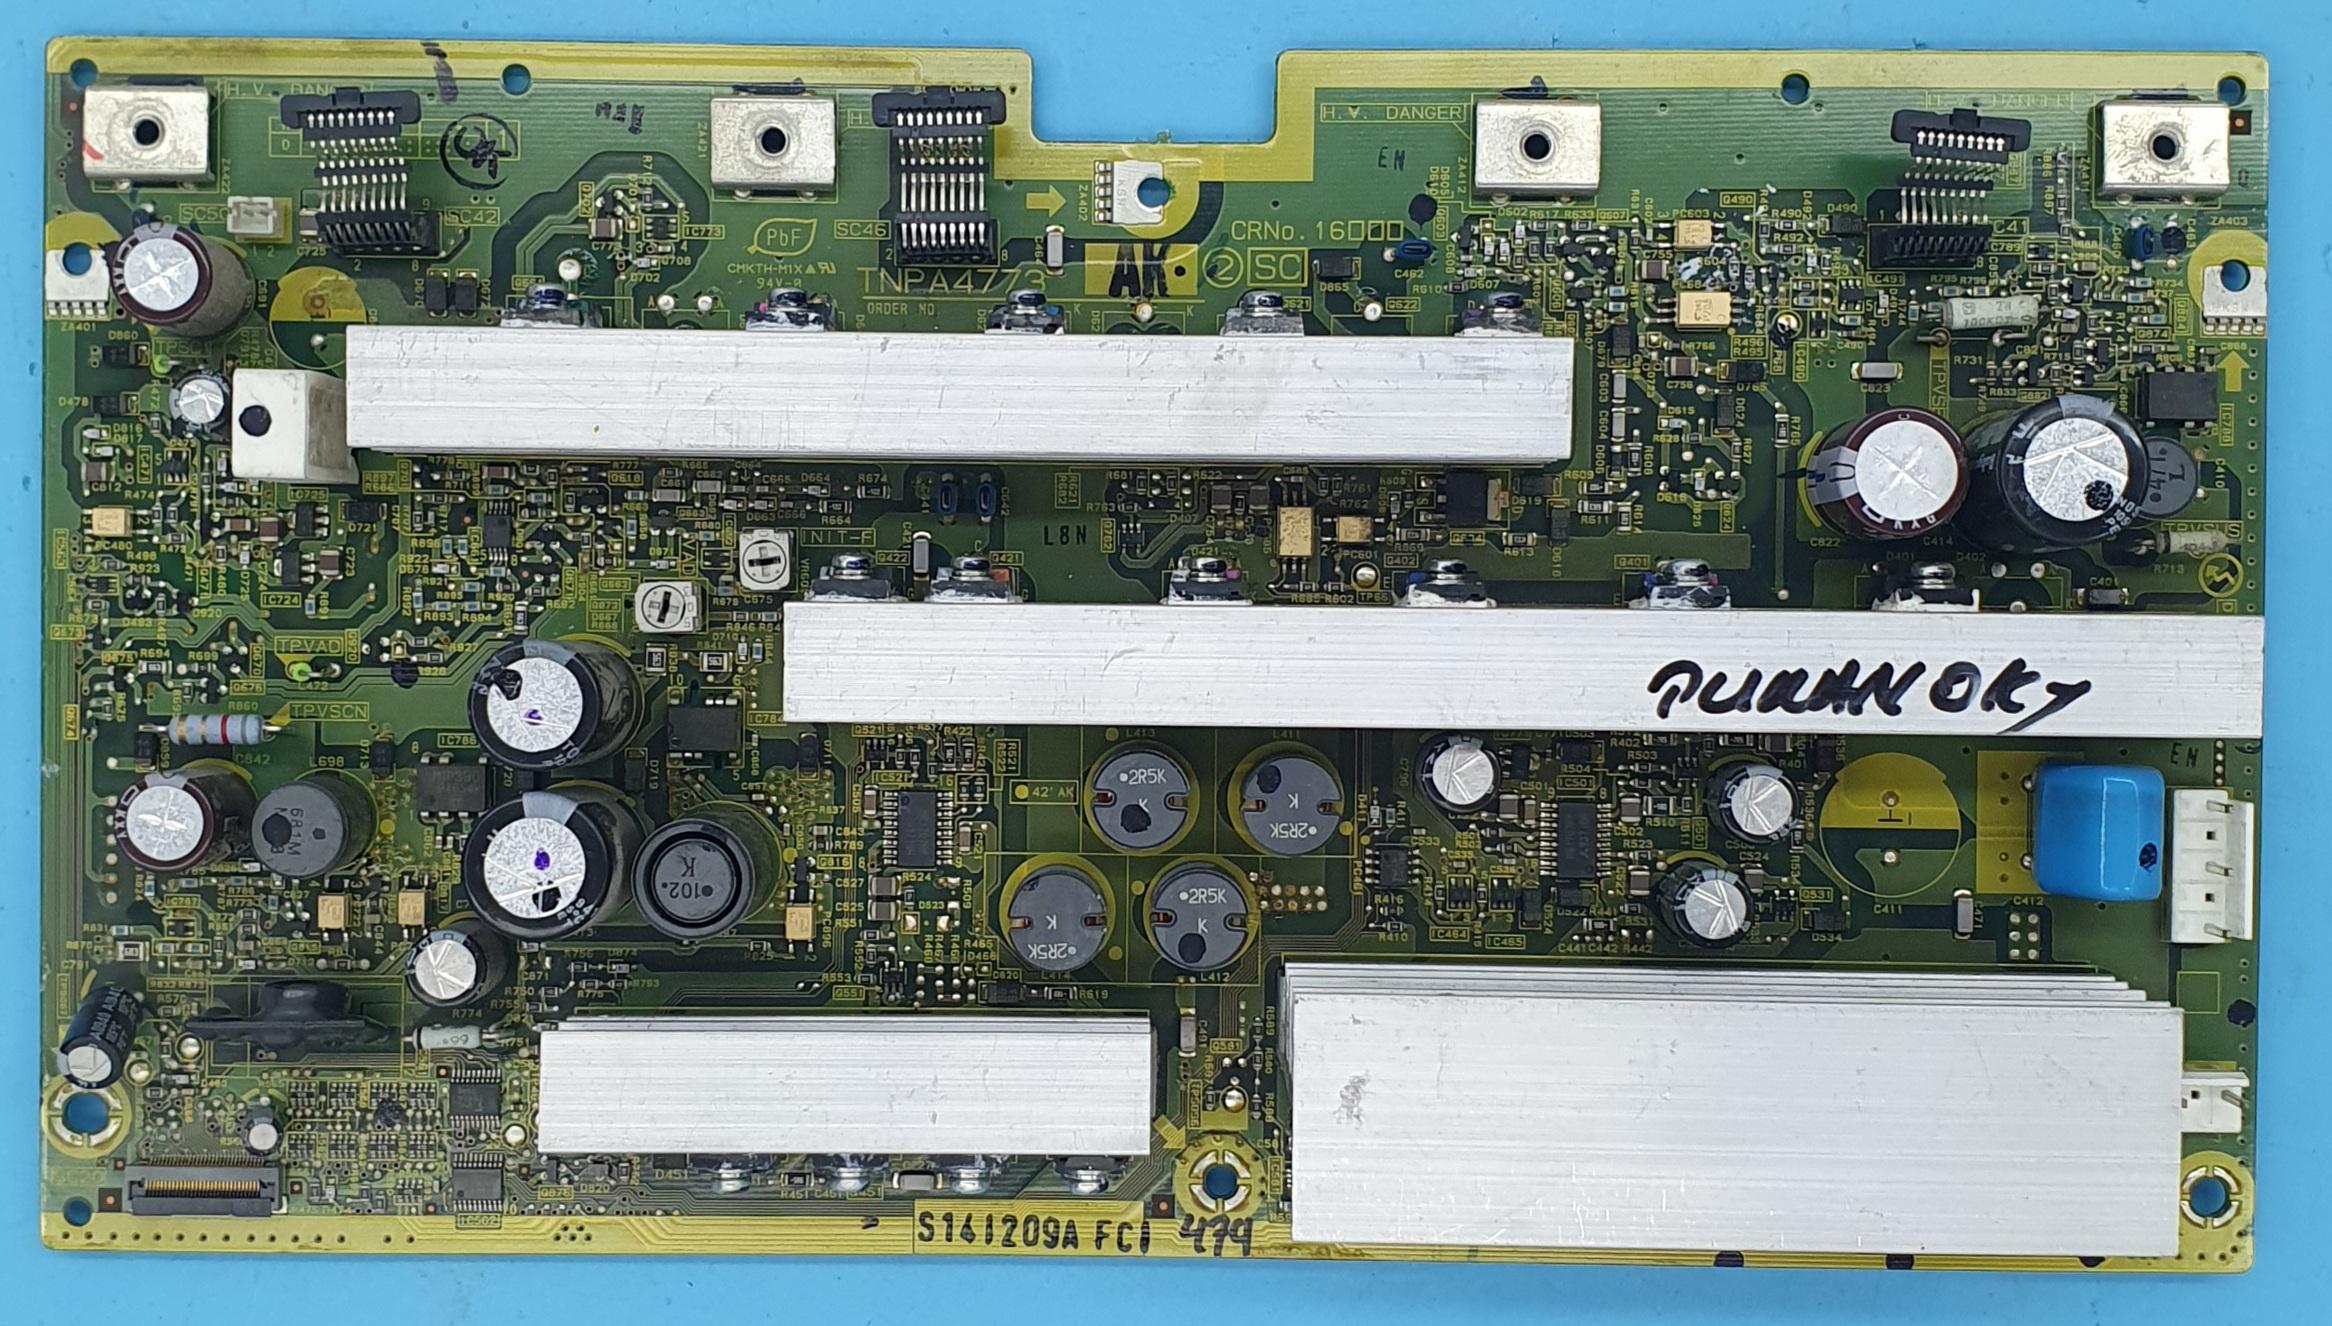 TNPA4773-2 Panasonic Y-SUS (KDV DAHİL = 150 TL)